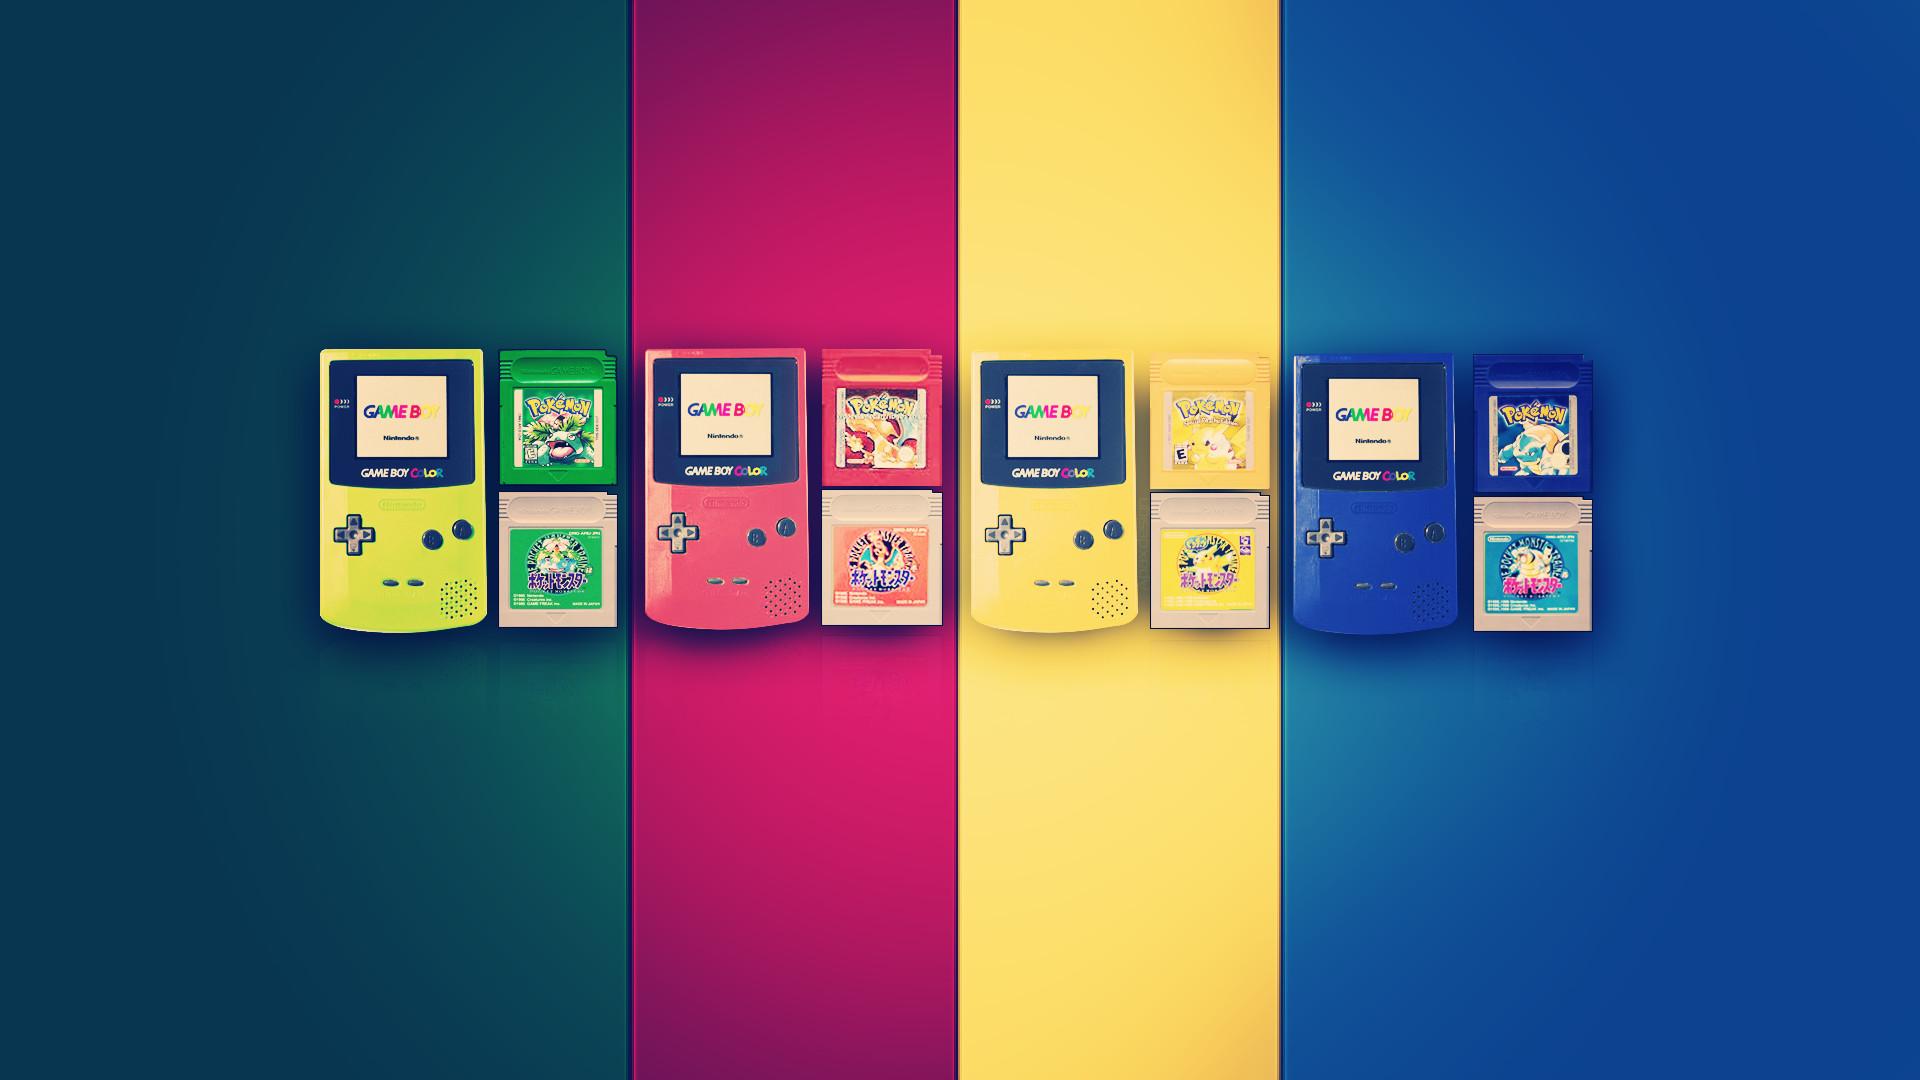 Fonds d'écran Game Boy : tous les wallpapers Game Boy